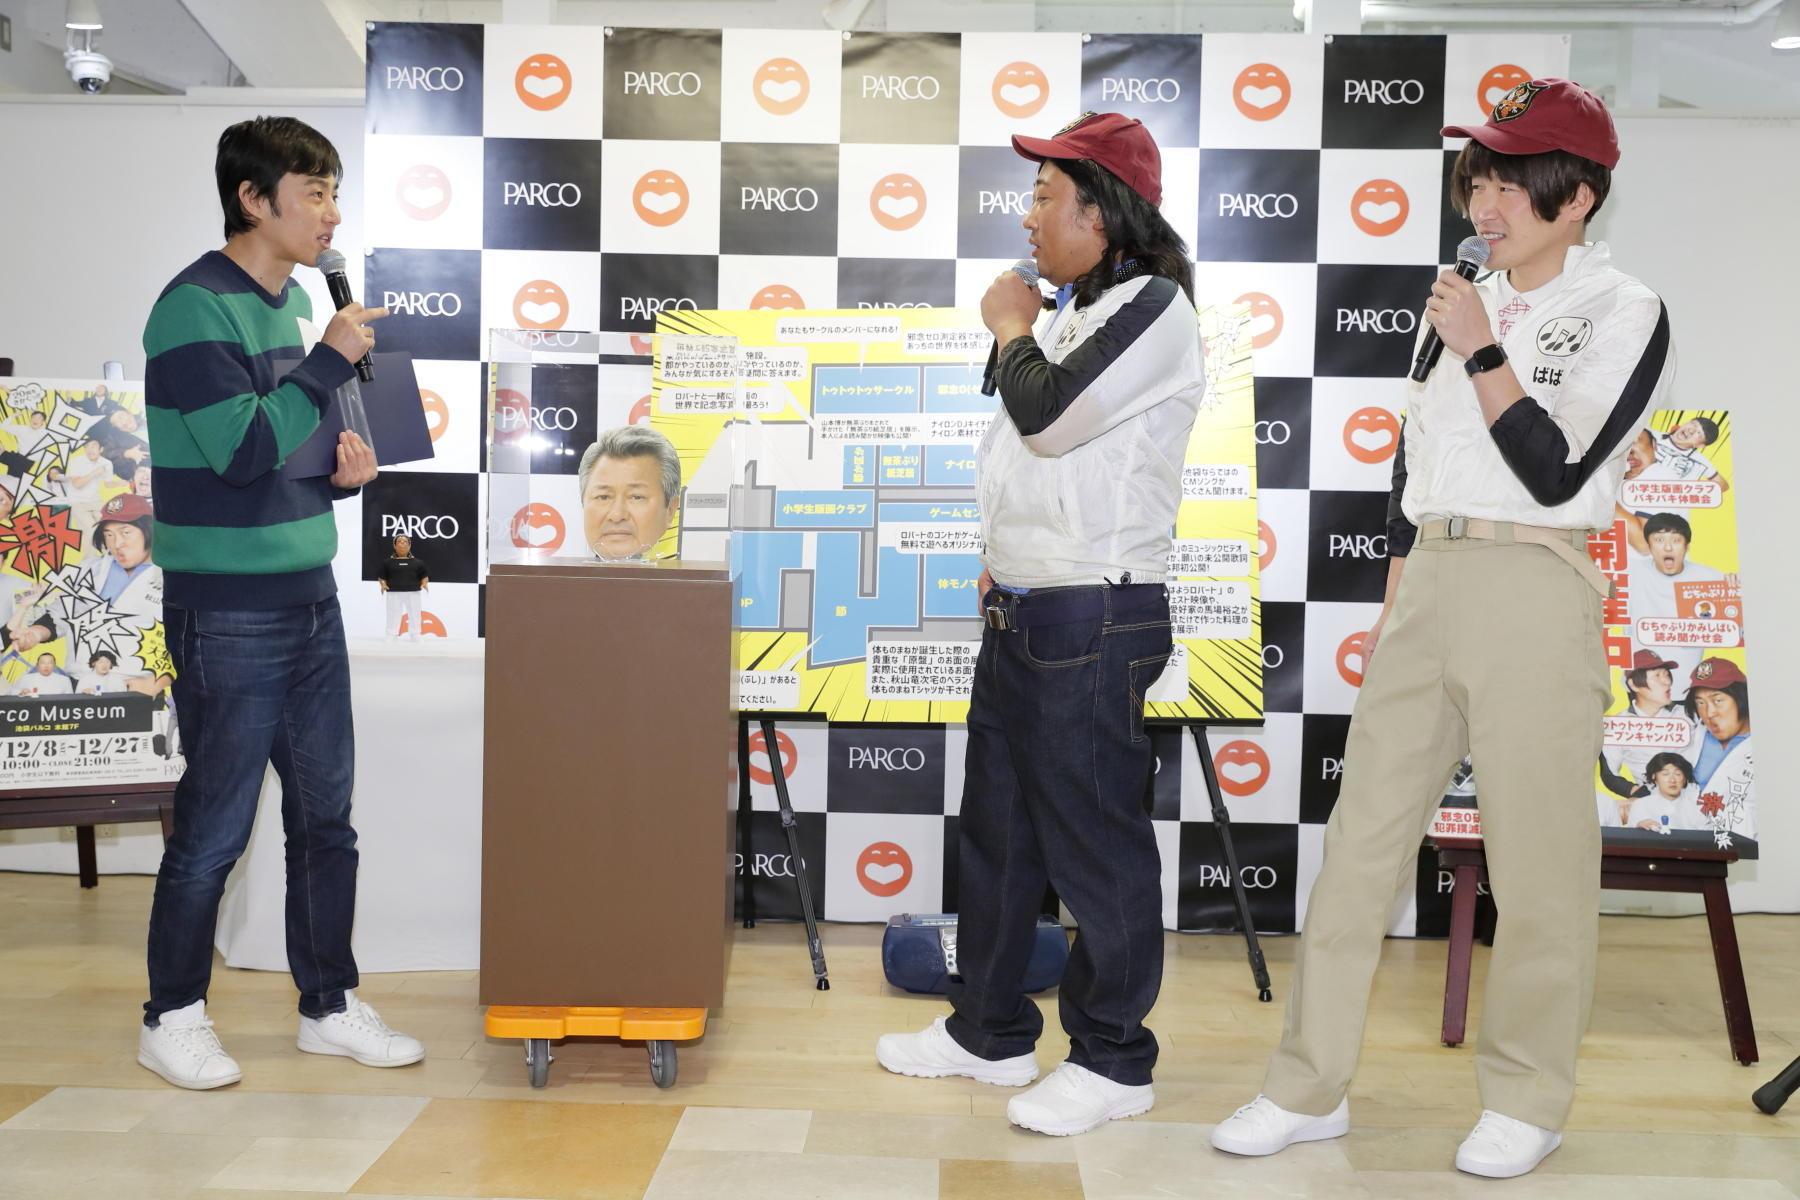 http://news.yoshimoto.co.jp/20181207184657-46798232fa11a070ea6908948b0b2978253d8c44.jpg